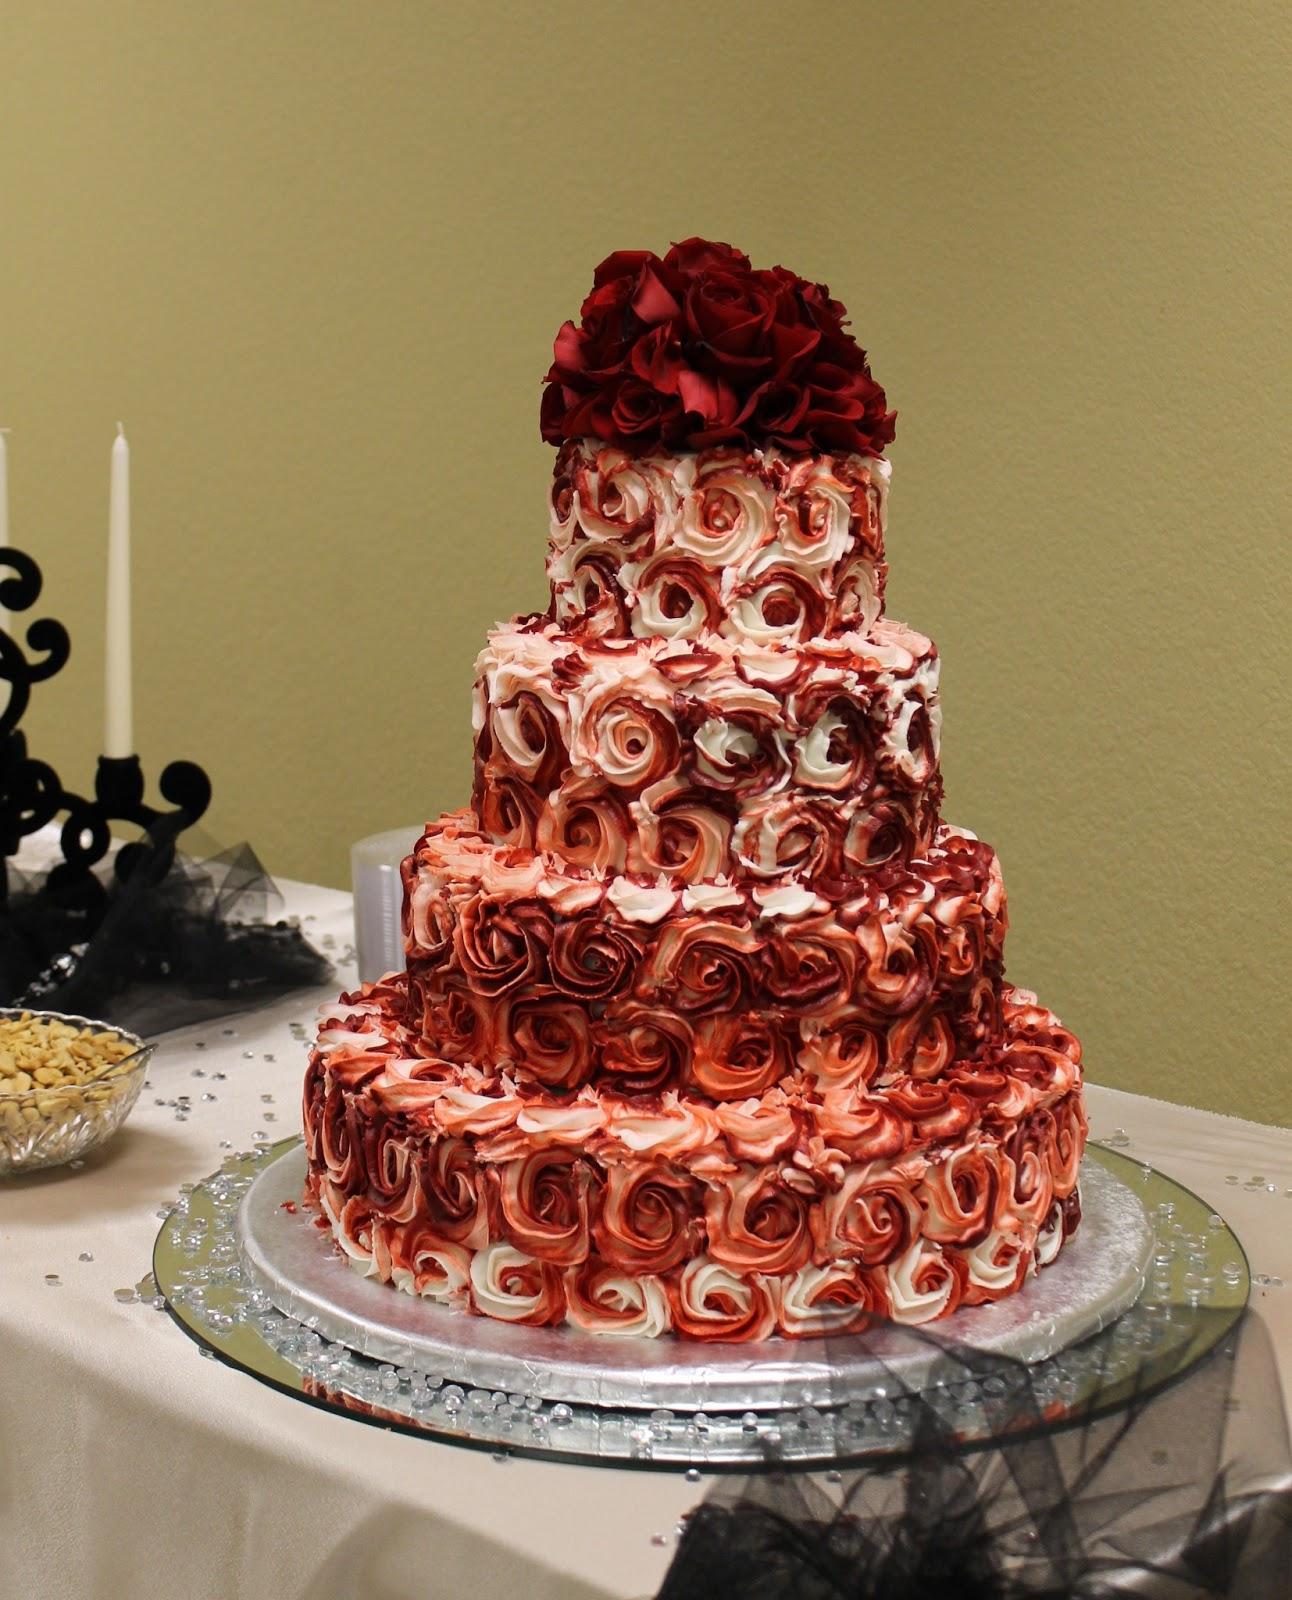 The Simple Cake February 2013